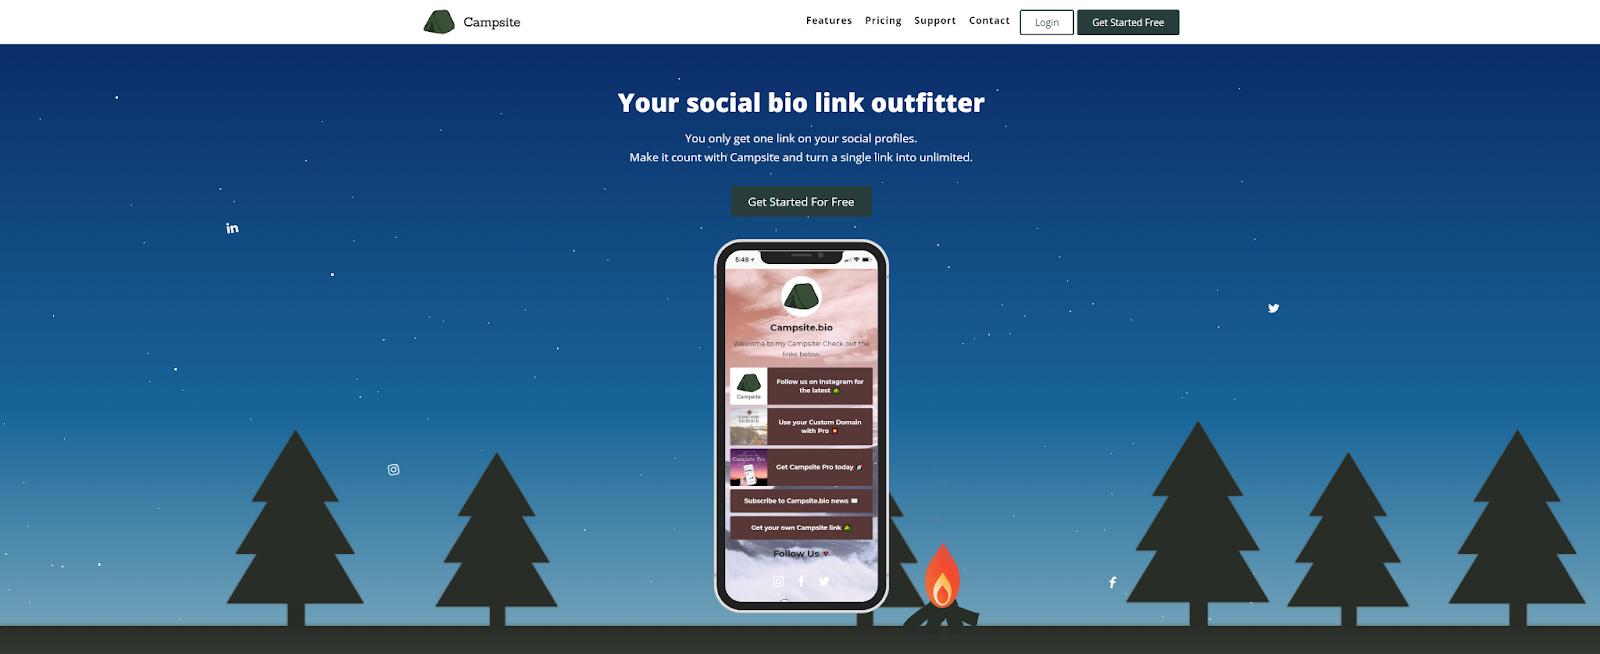 Campfire website